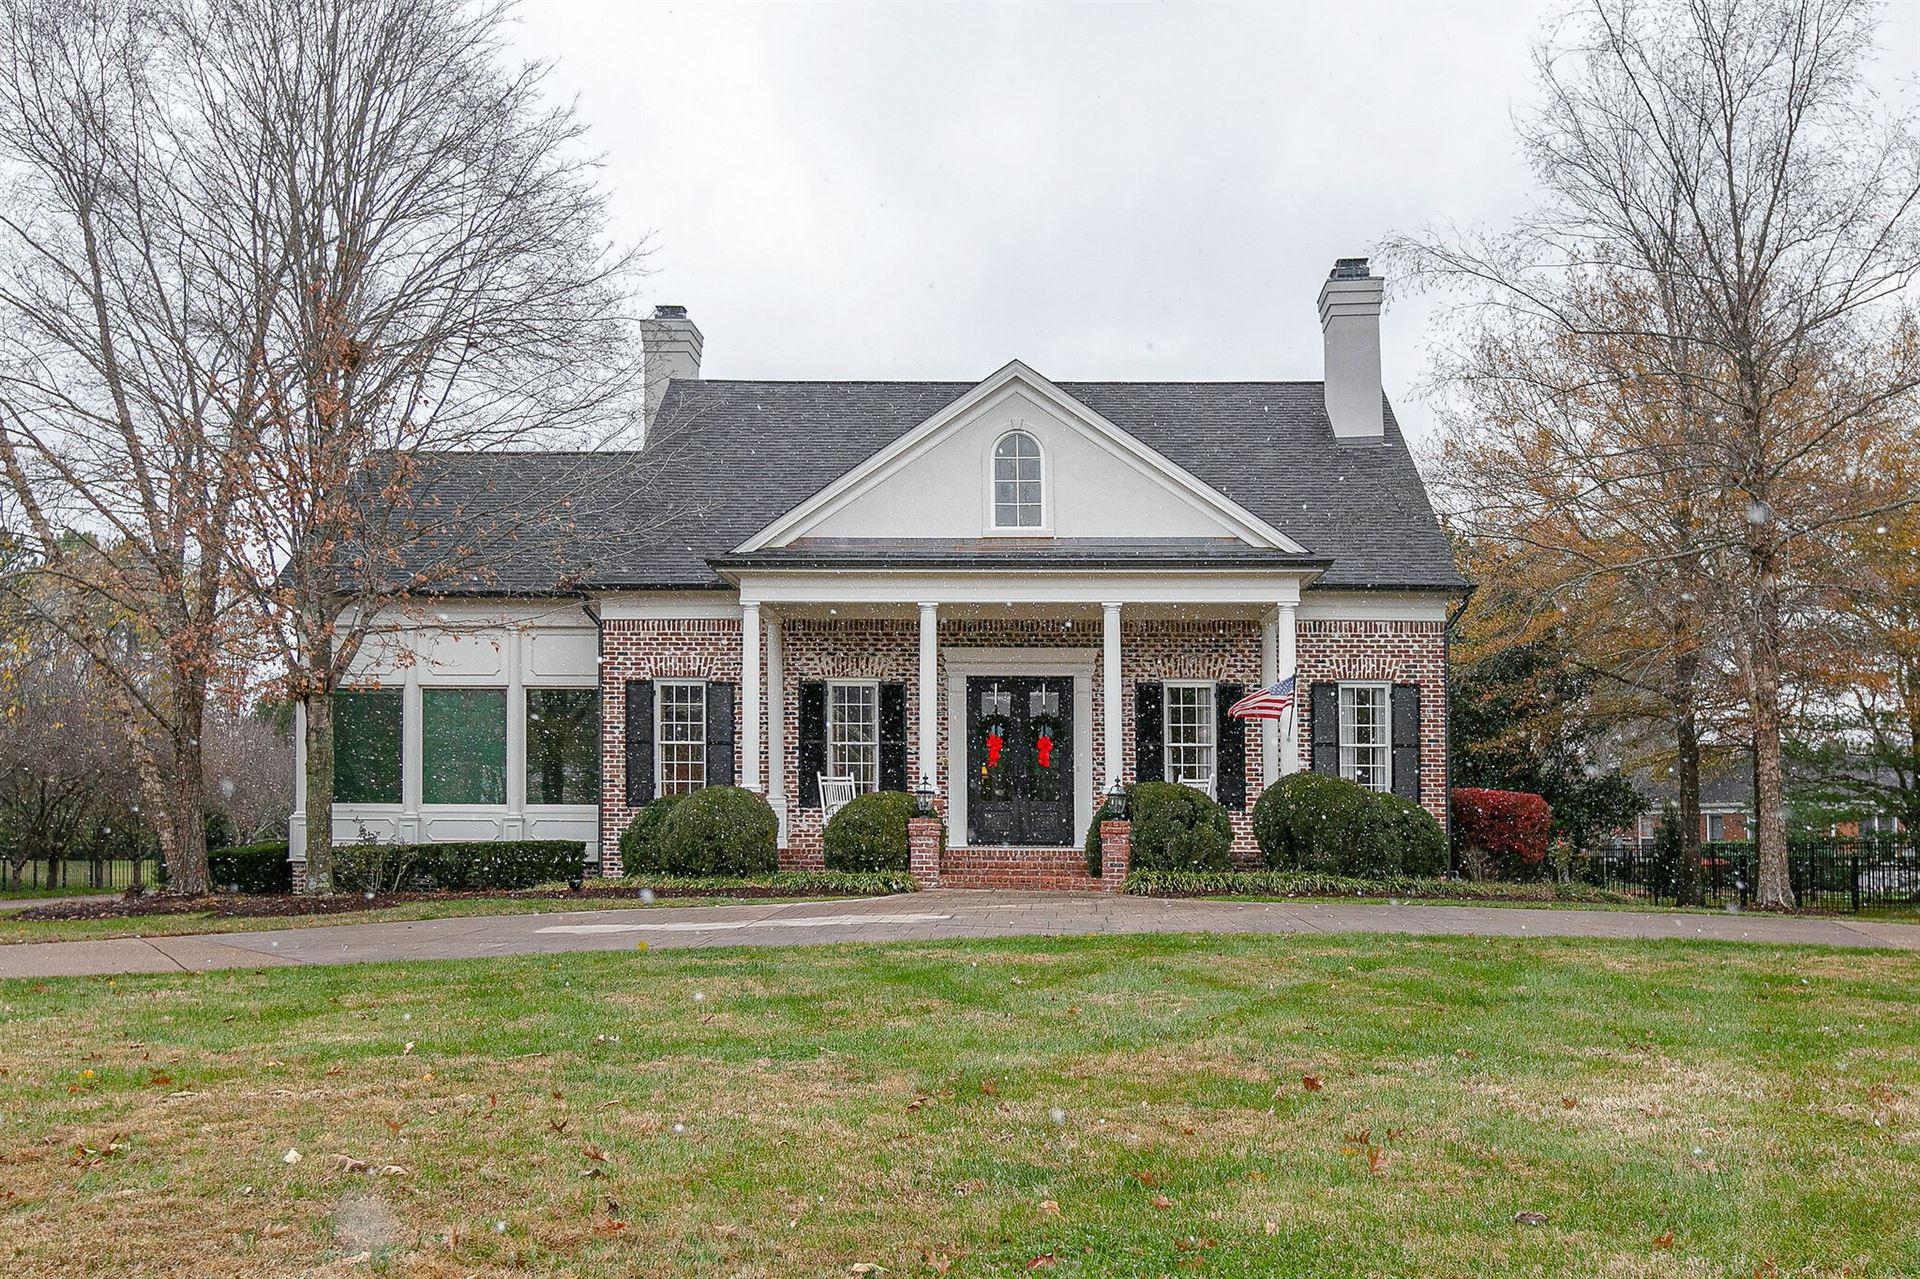 735 Princeton Hills Dr, Brentwood, TN 37027 - MLS#: 2210492